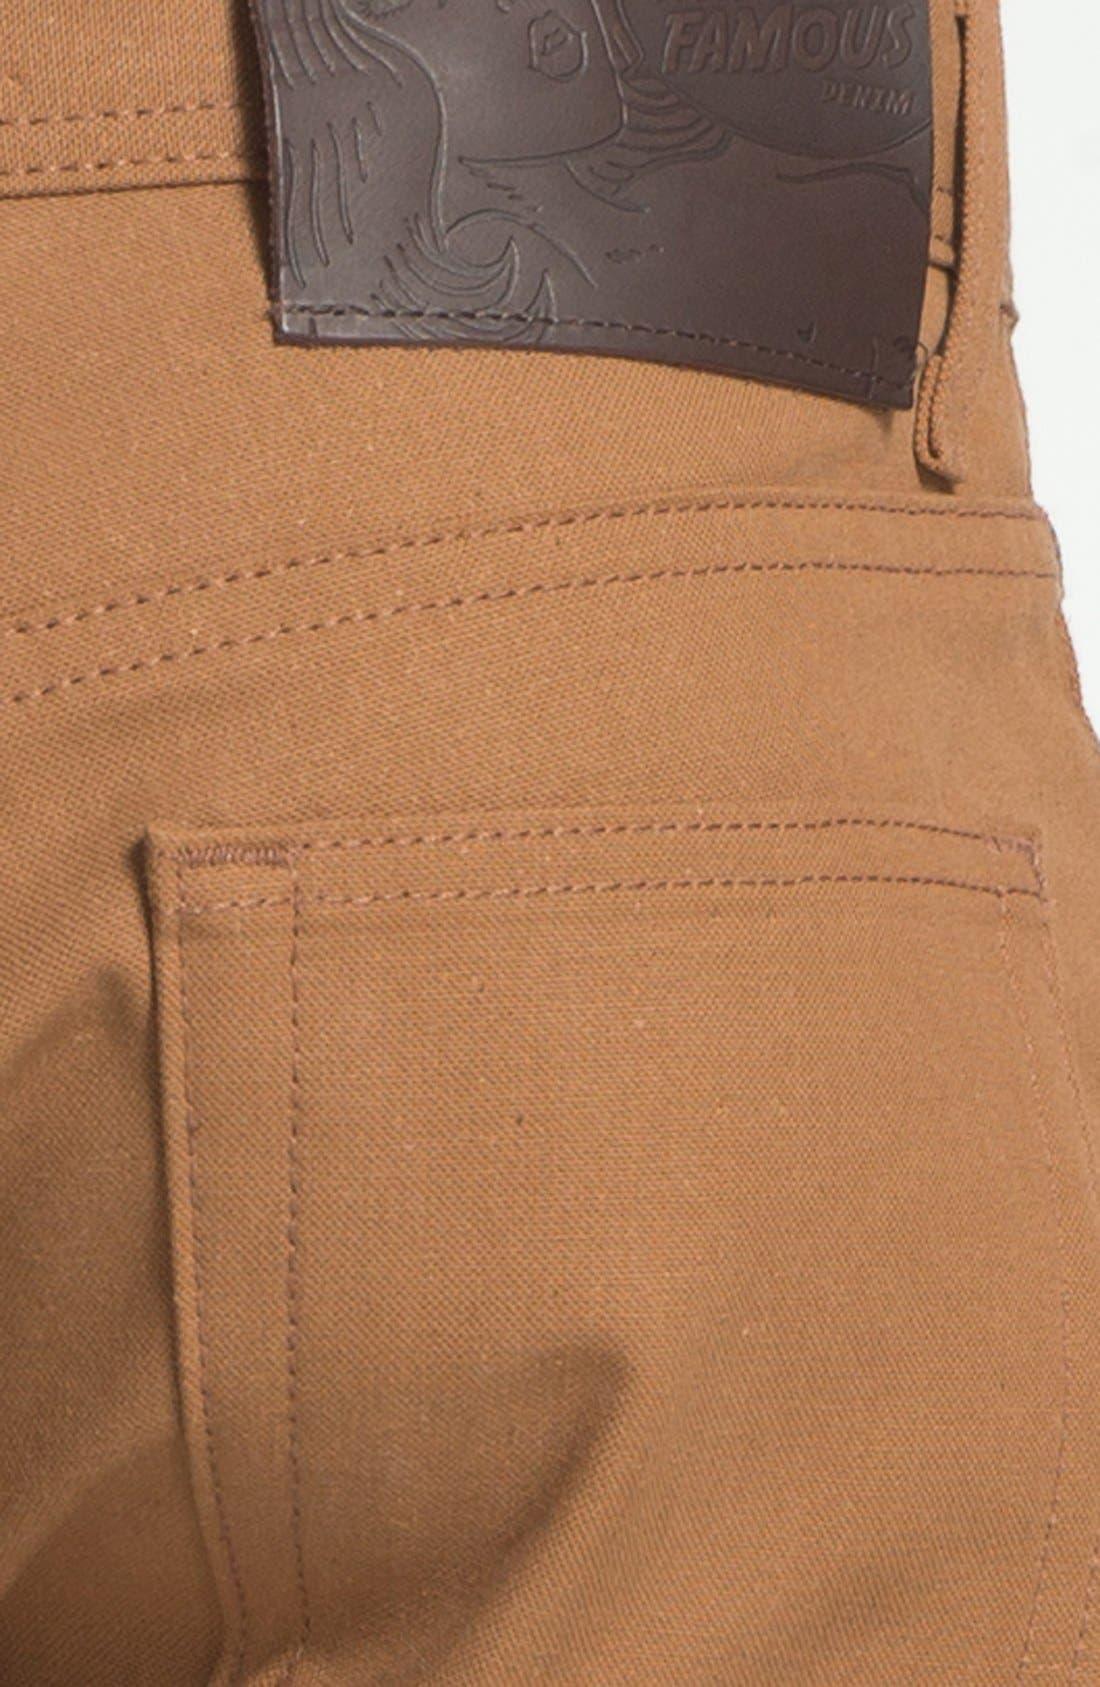 Alternate Image 4  - Naked & Famous Denim Weird Guy Slim Selvedge Duck Canvas Jeans (Vintage Brown Khaki)